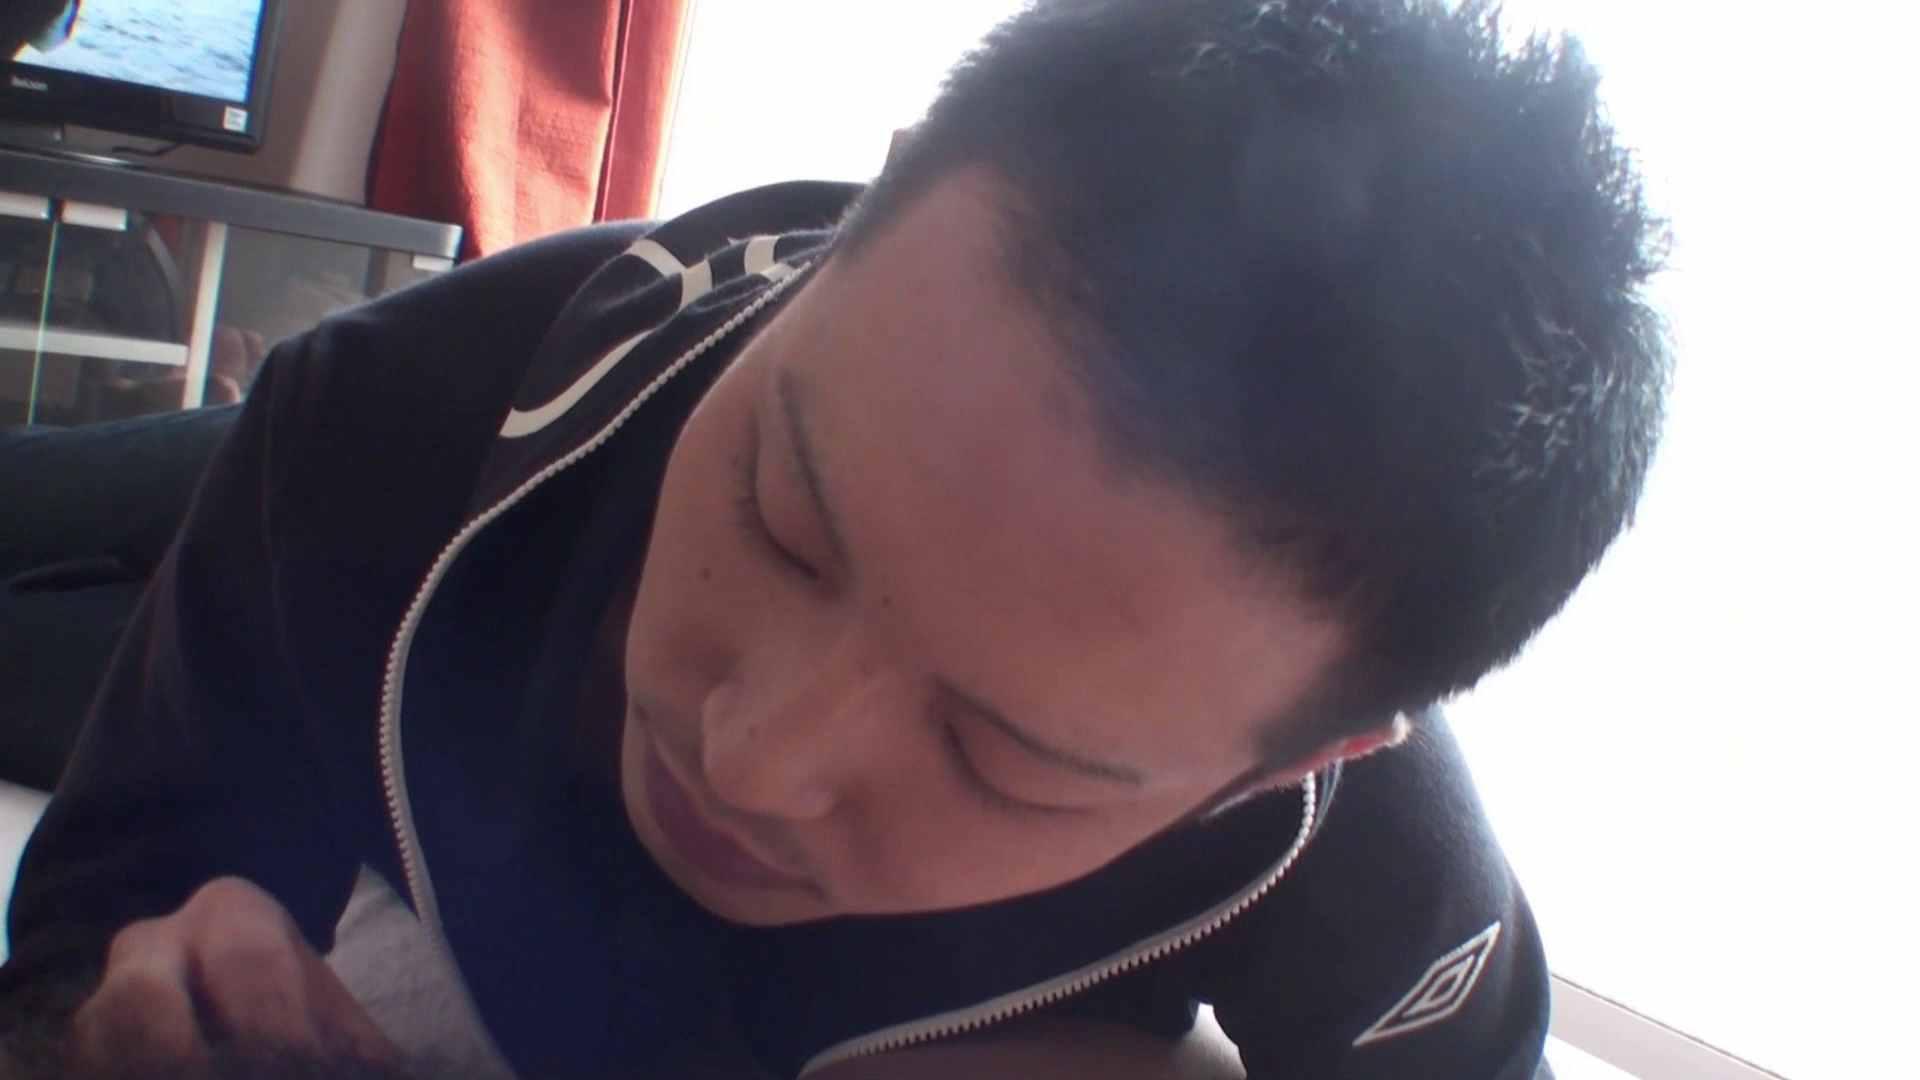 HD 良太と健二当たり前の日常 お口処理編 男子カップル ゲイモロ見え画像 56枚 55